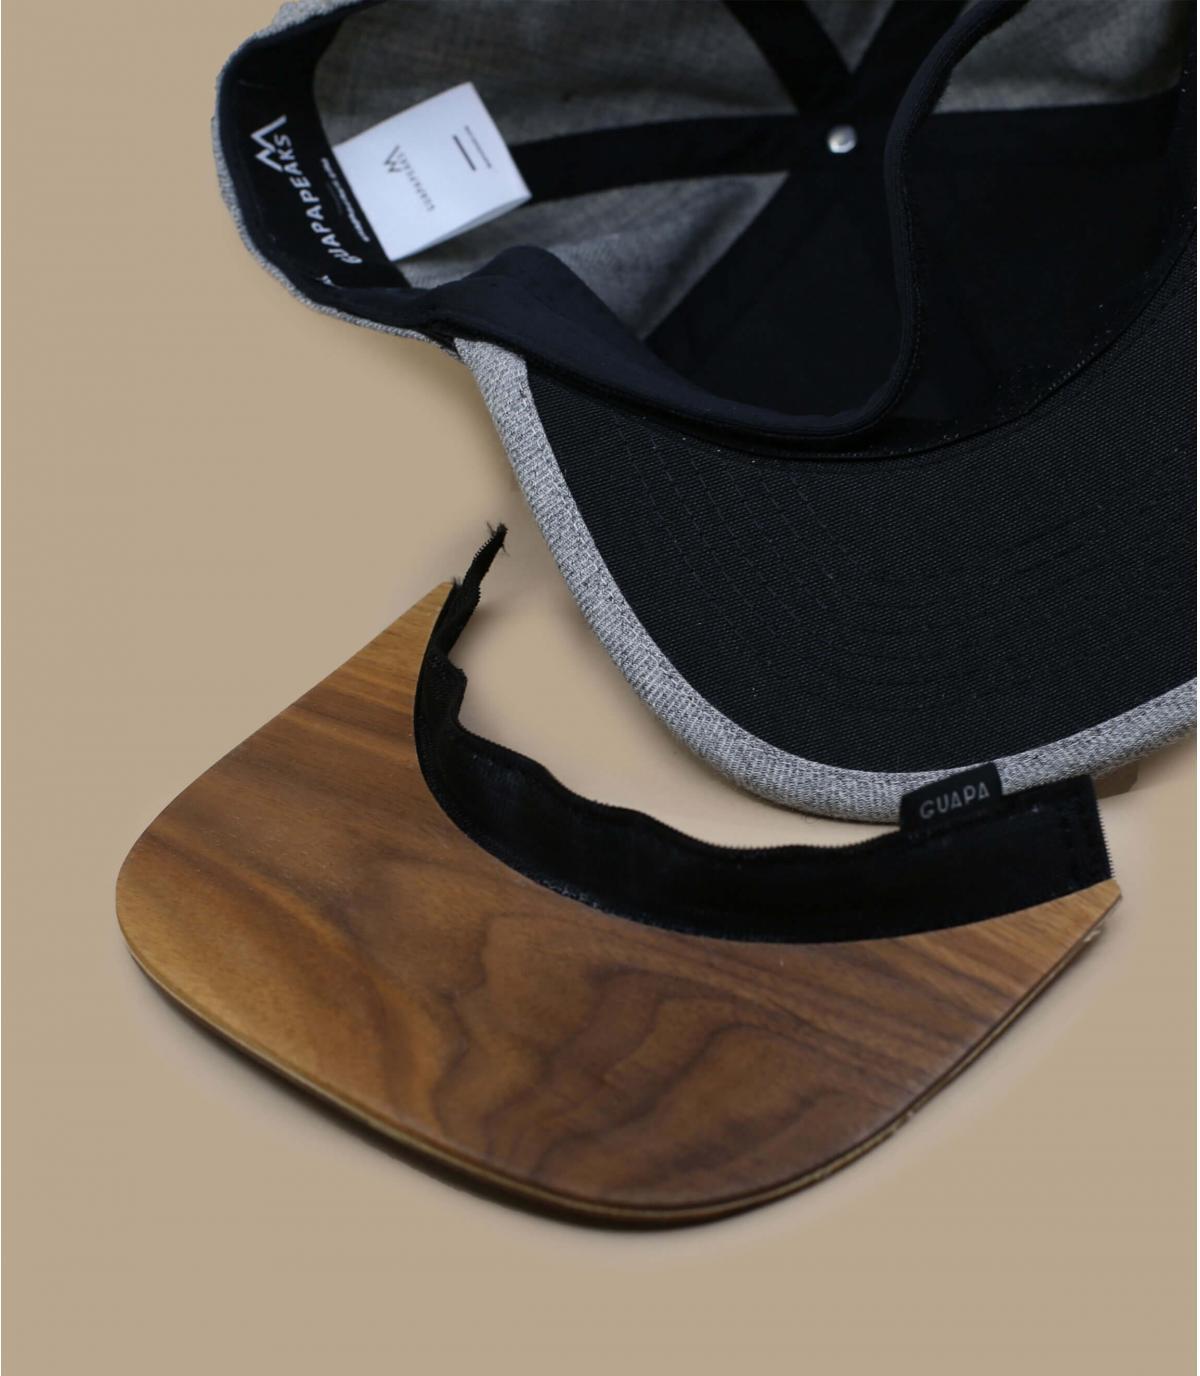 Details Snapback Recycled heather grey - Abbildung 4